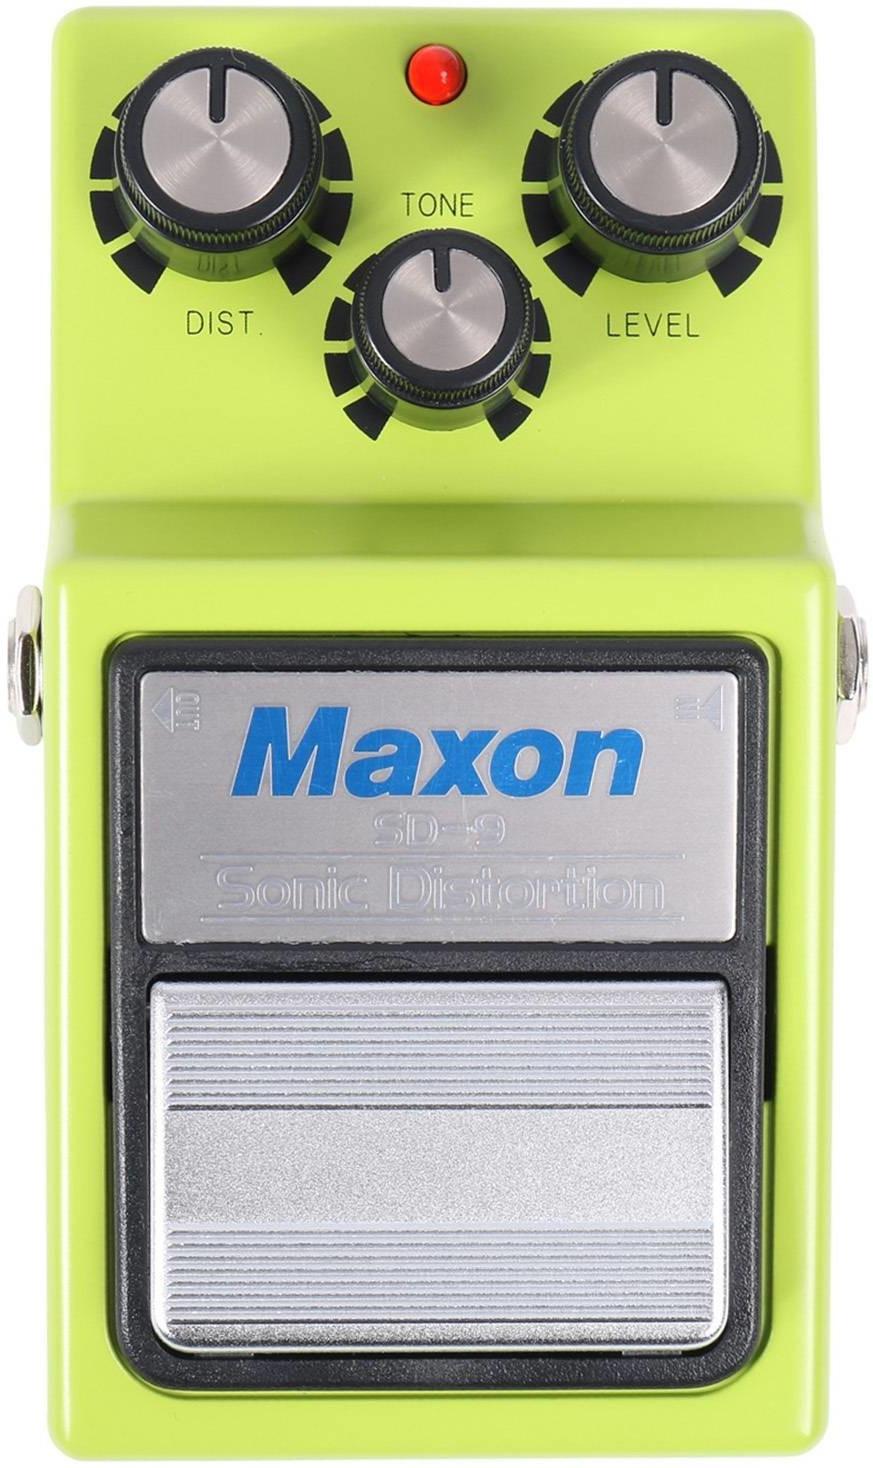 Image of Maxon SD-9 Sonic Distortion